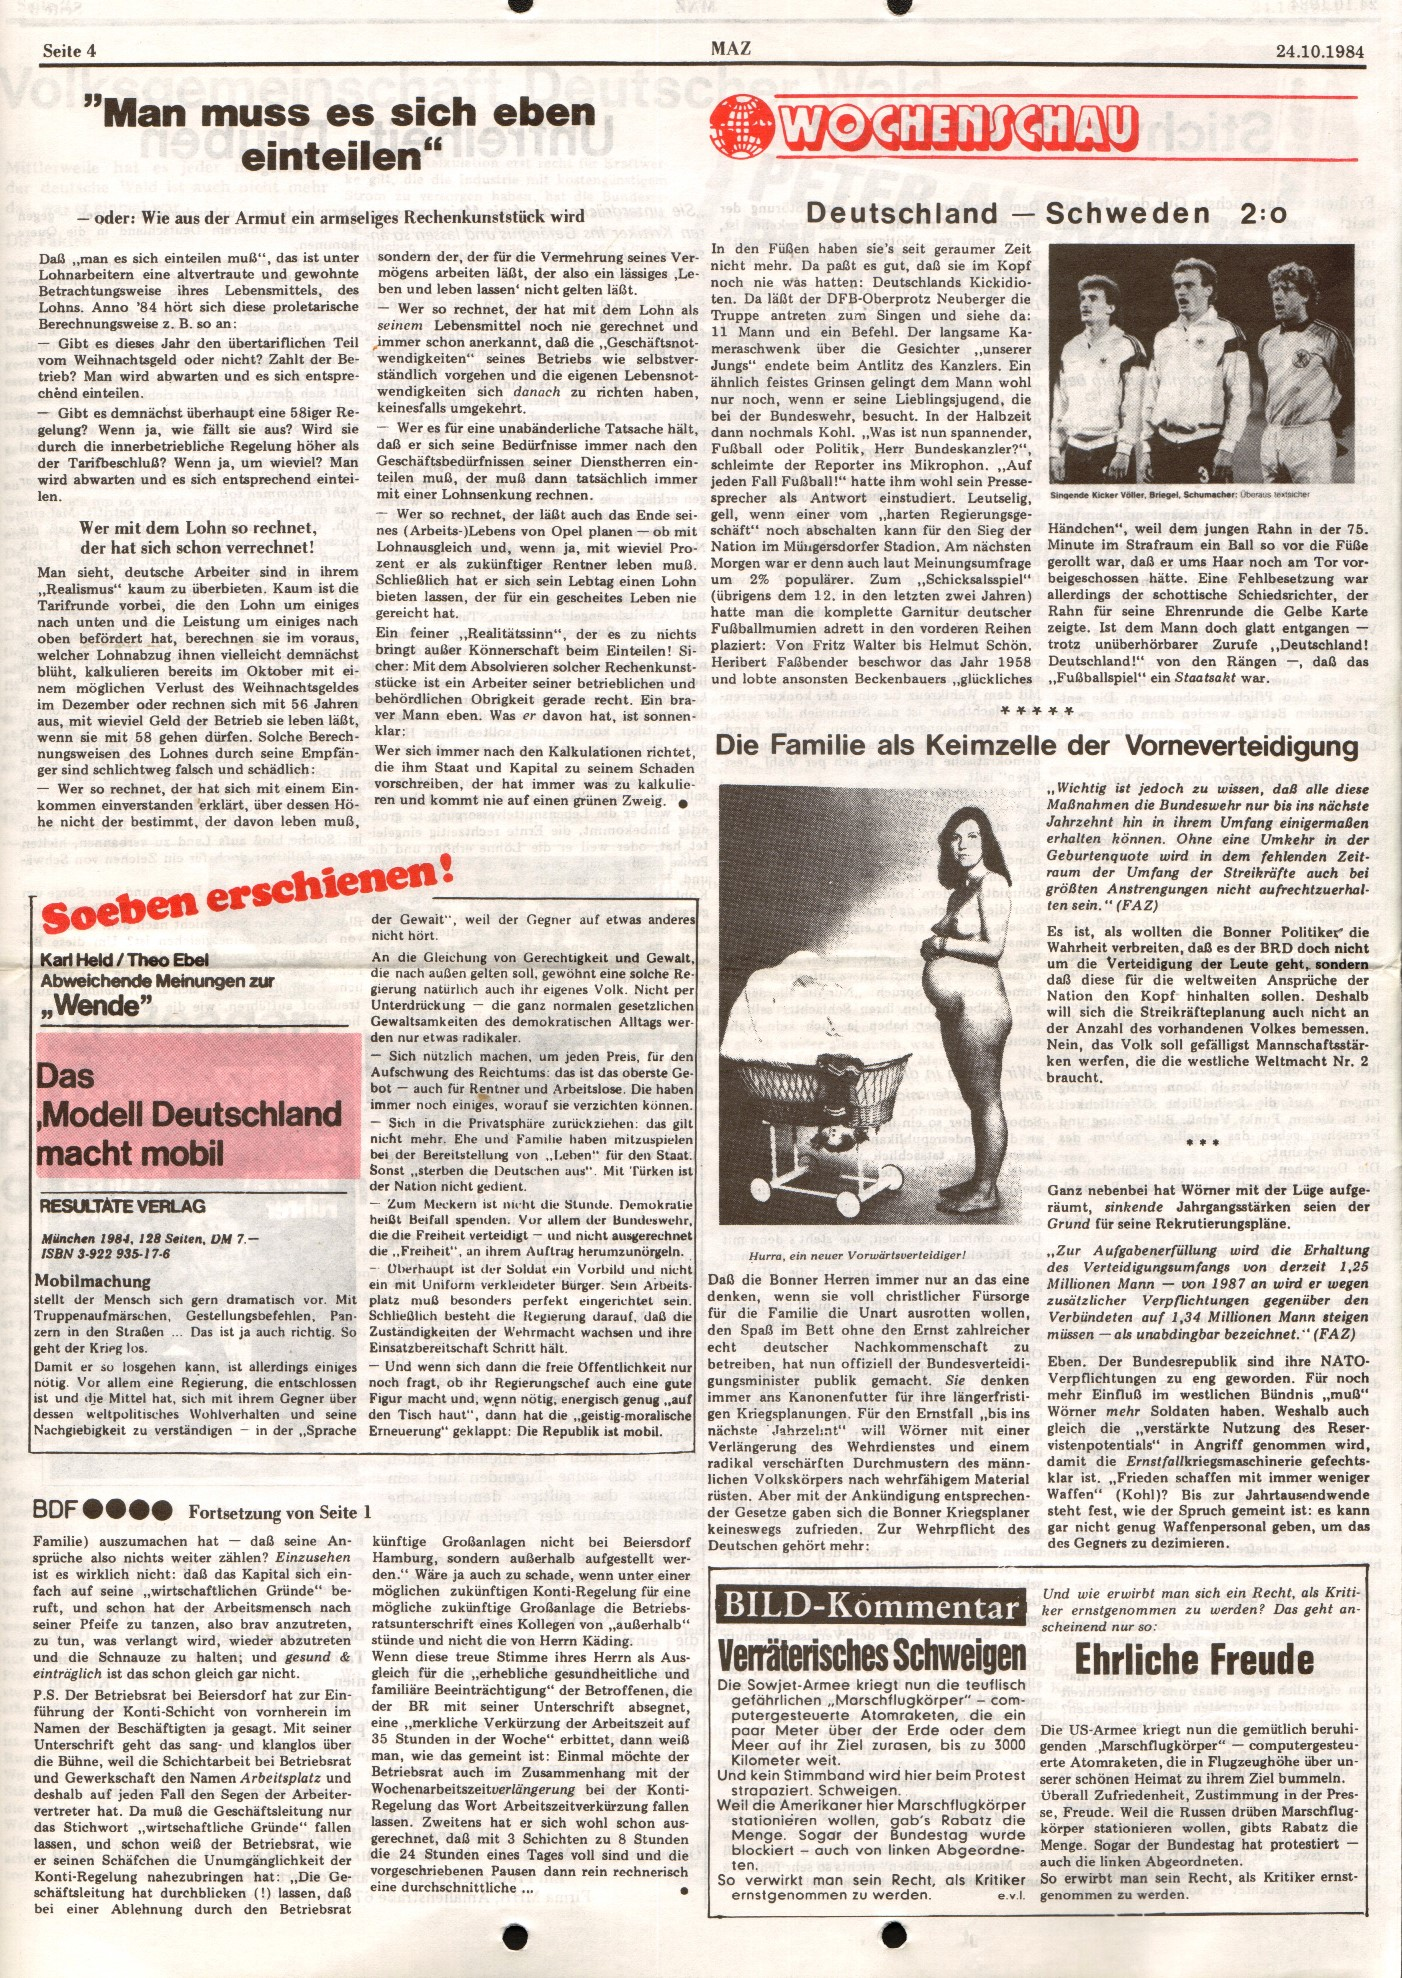 Hamburg_MG_MAZ_Chemie_19841024_04